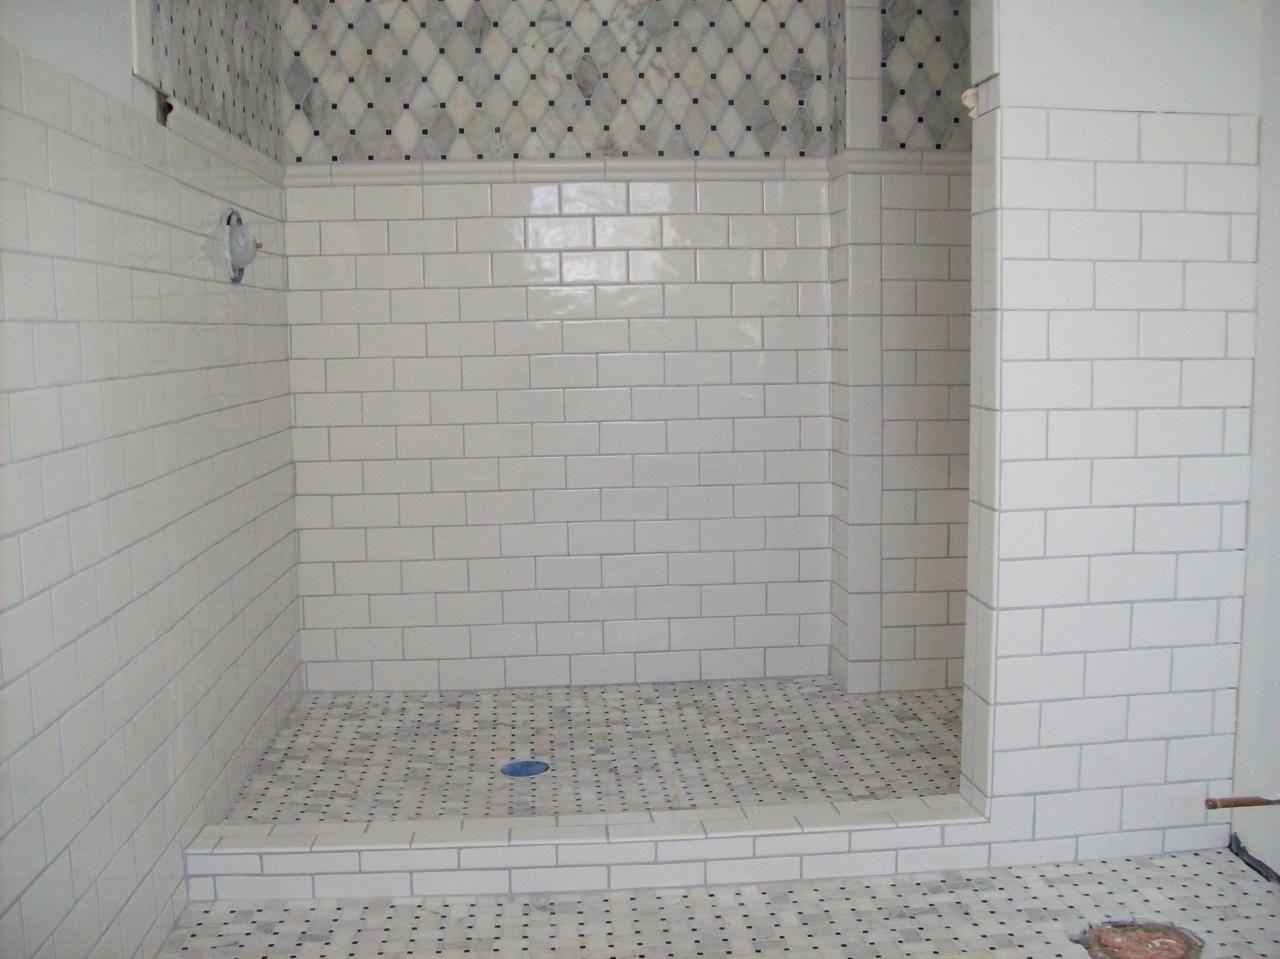 Subway floor tiles for bathroom